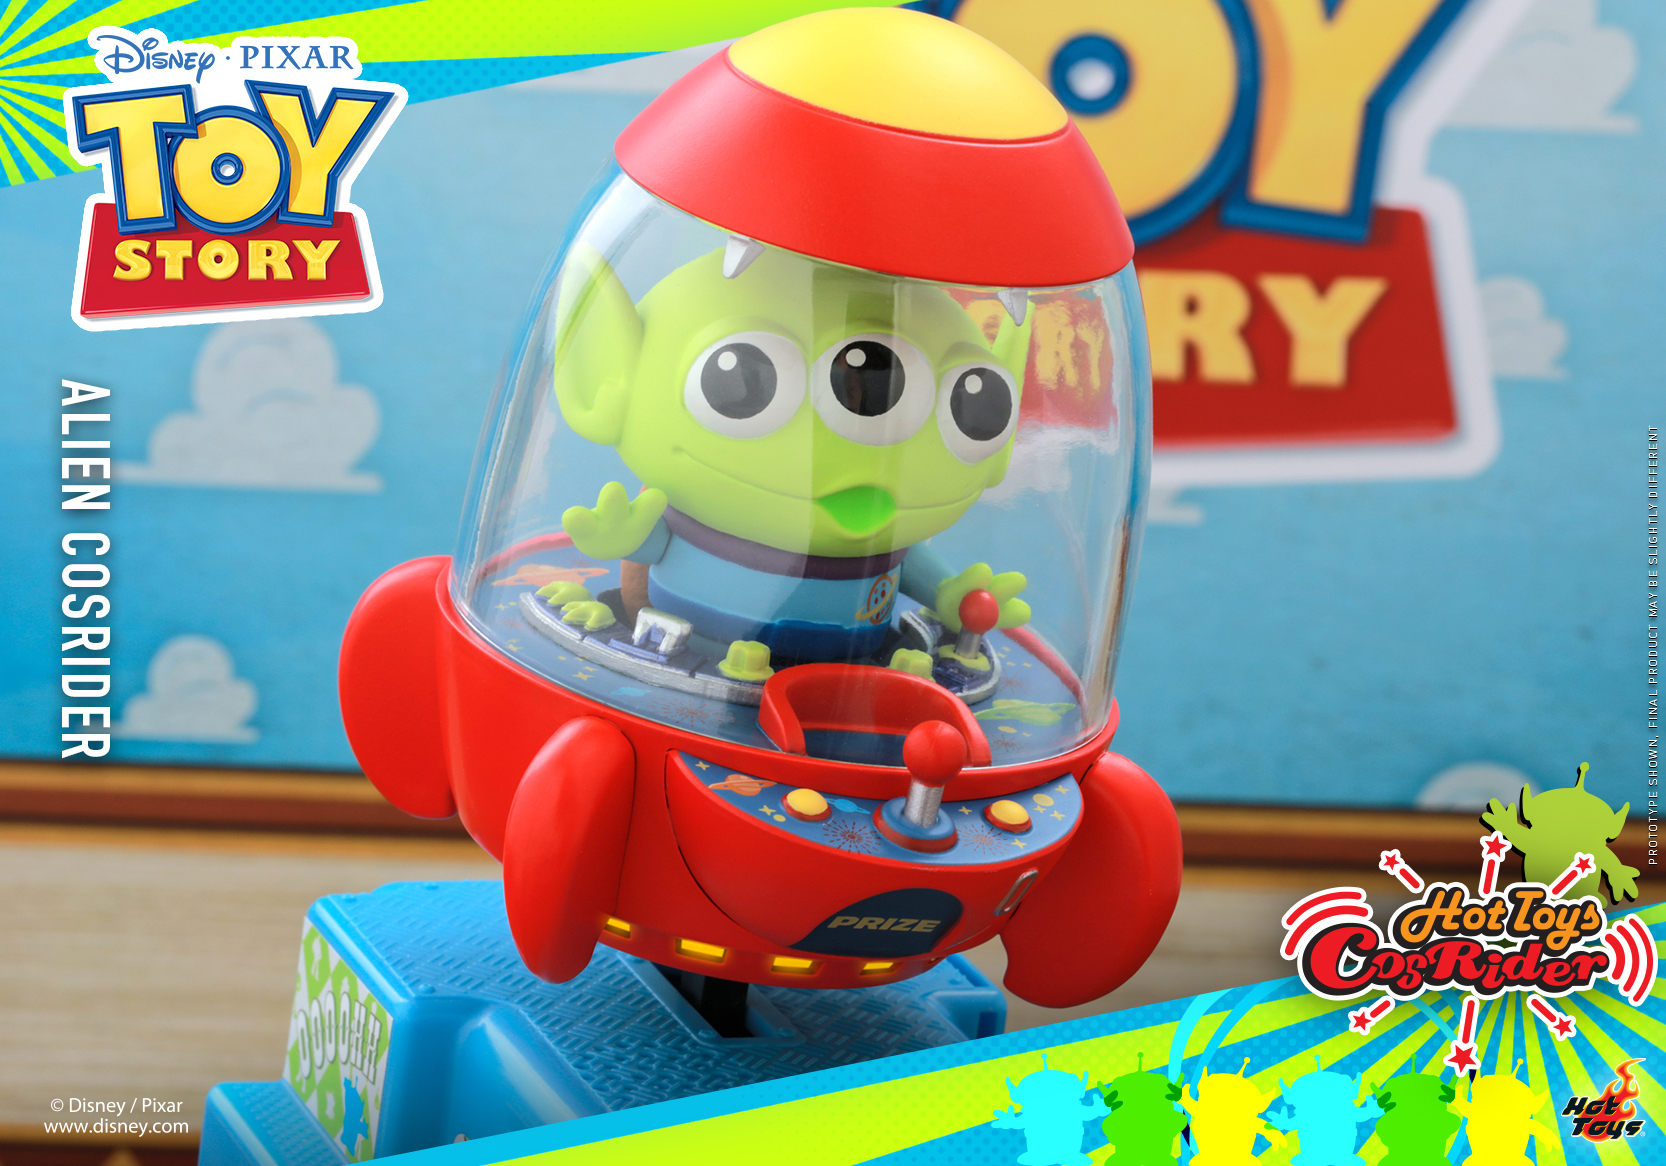 Hot Toys - Toy Story - Alien CosRider_PR2